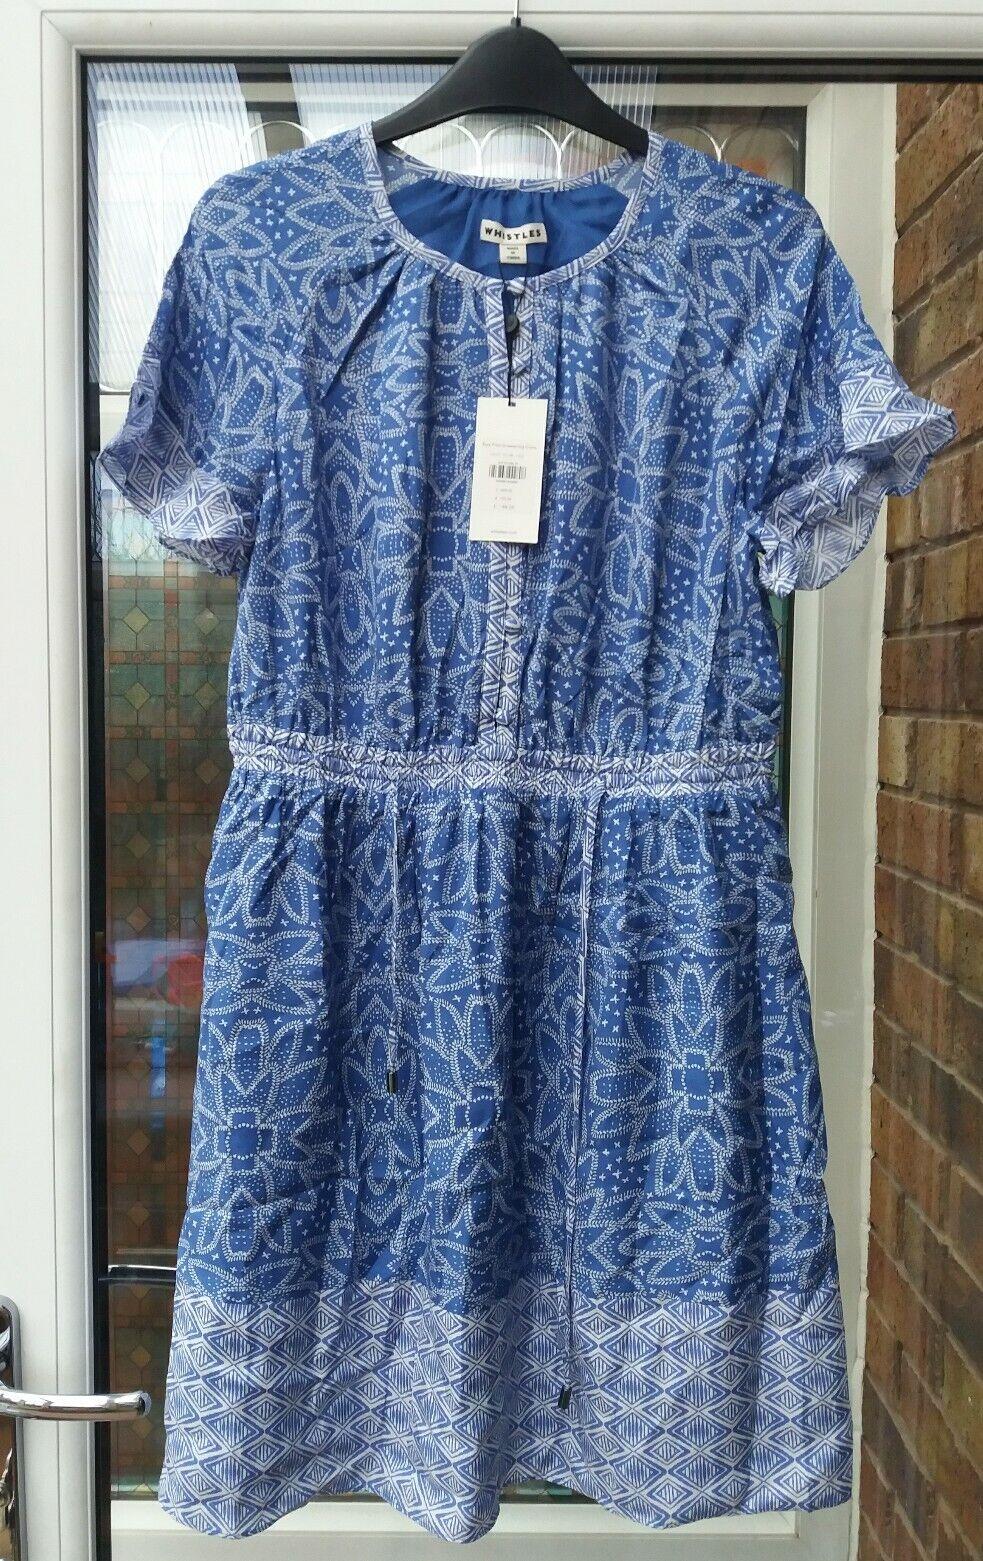 BNWT Whistles Riya Print Drawstring Dress Blau UK10 12 rrp